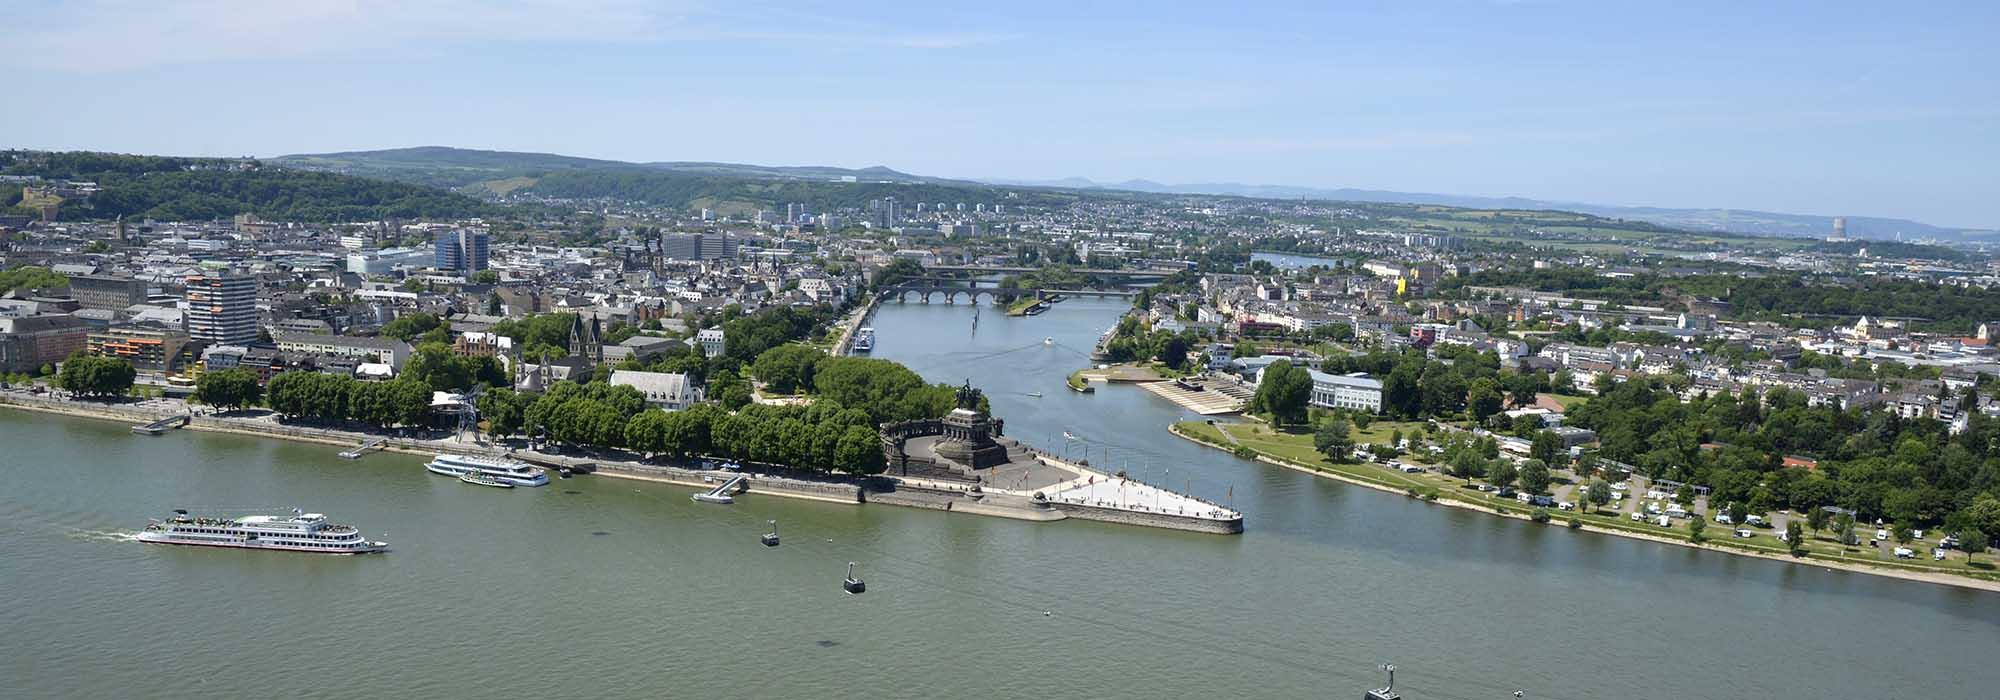 Koblenz_ARN0795